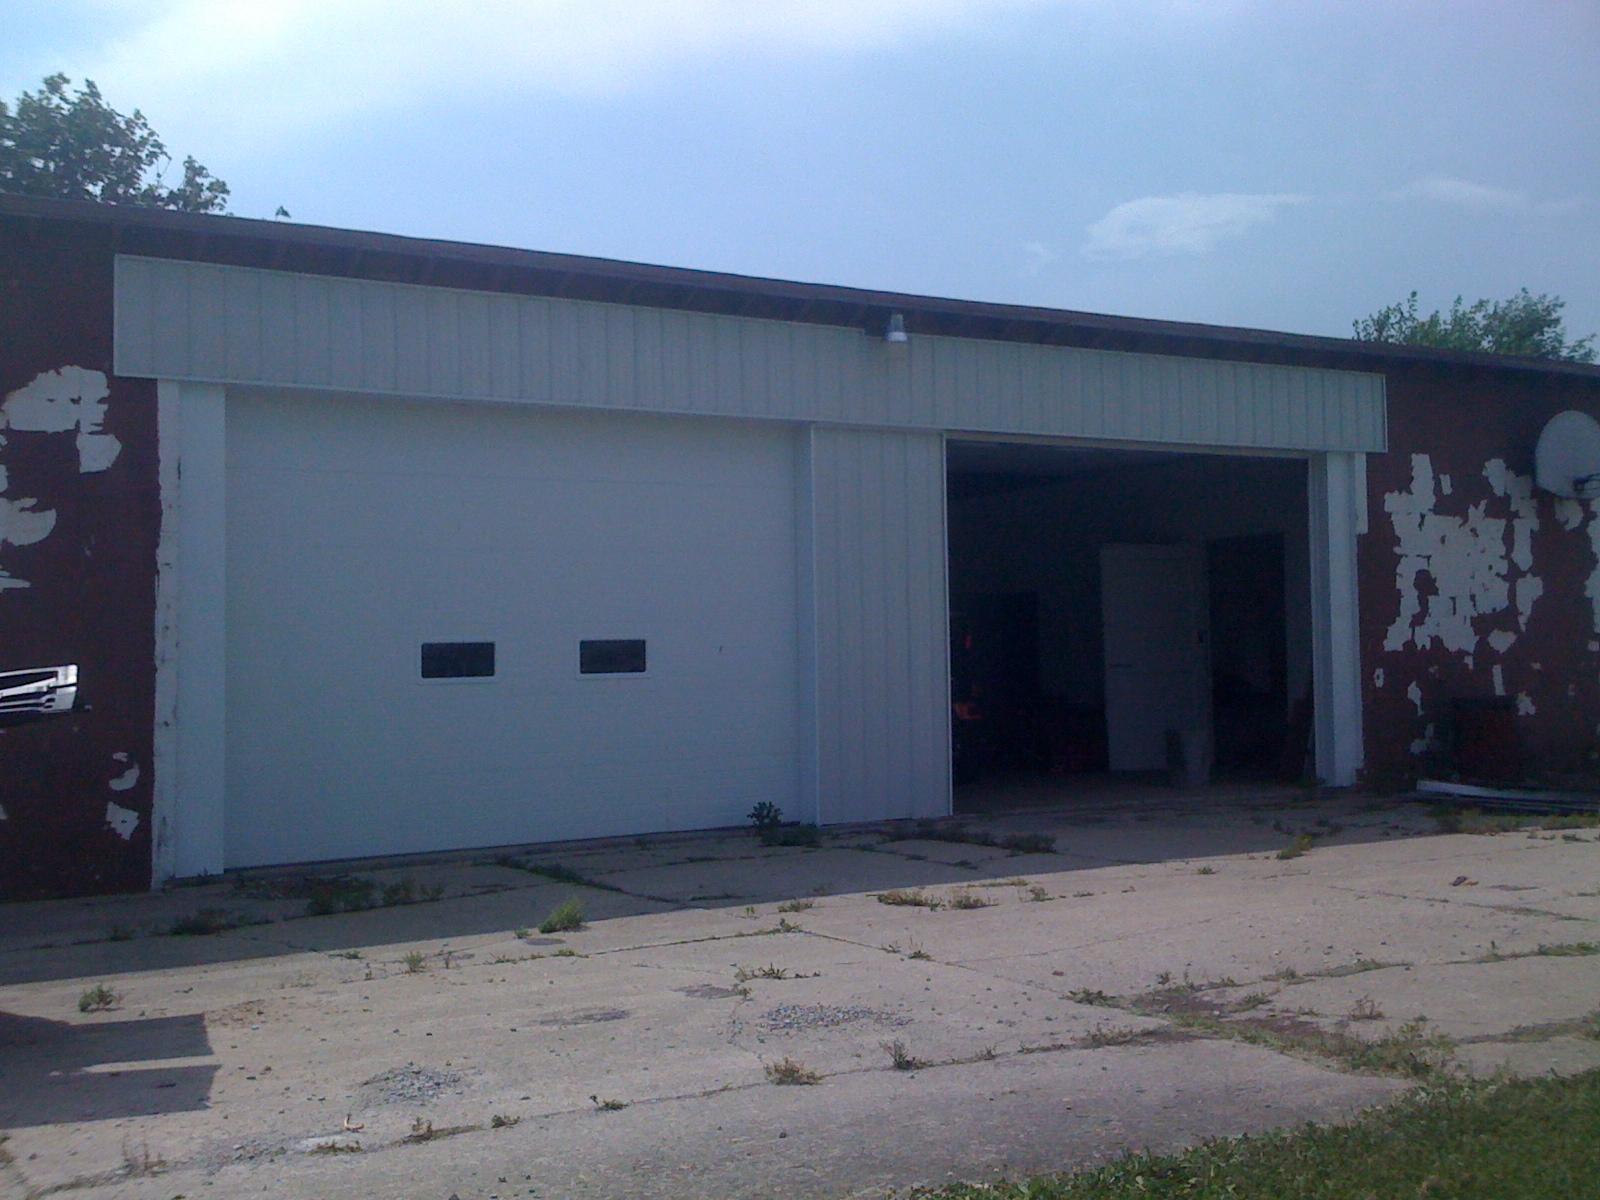 1200 #0A69C1 Custom Garage Doors Ltd In Arcanum OH 45304 ChamberofCommerce.com pic Garage Doors Dallas 36311600